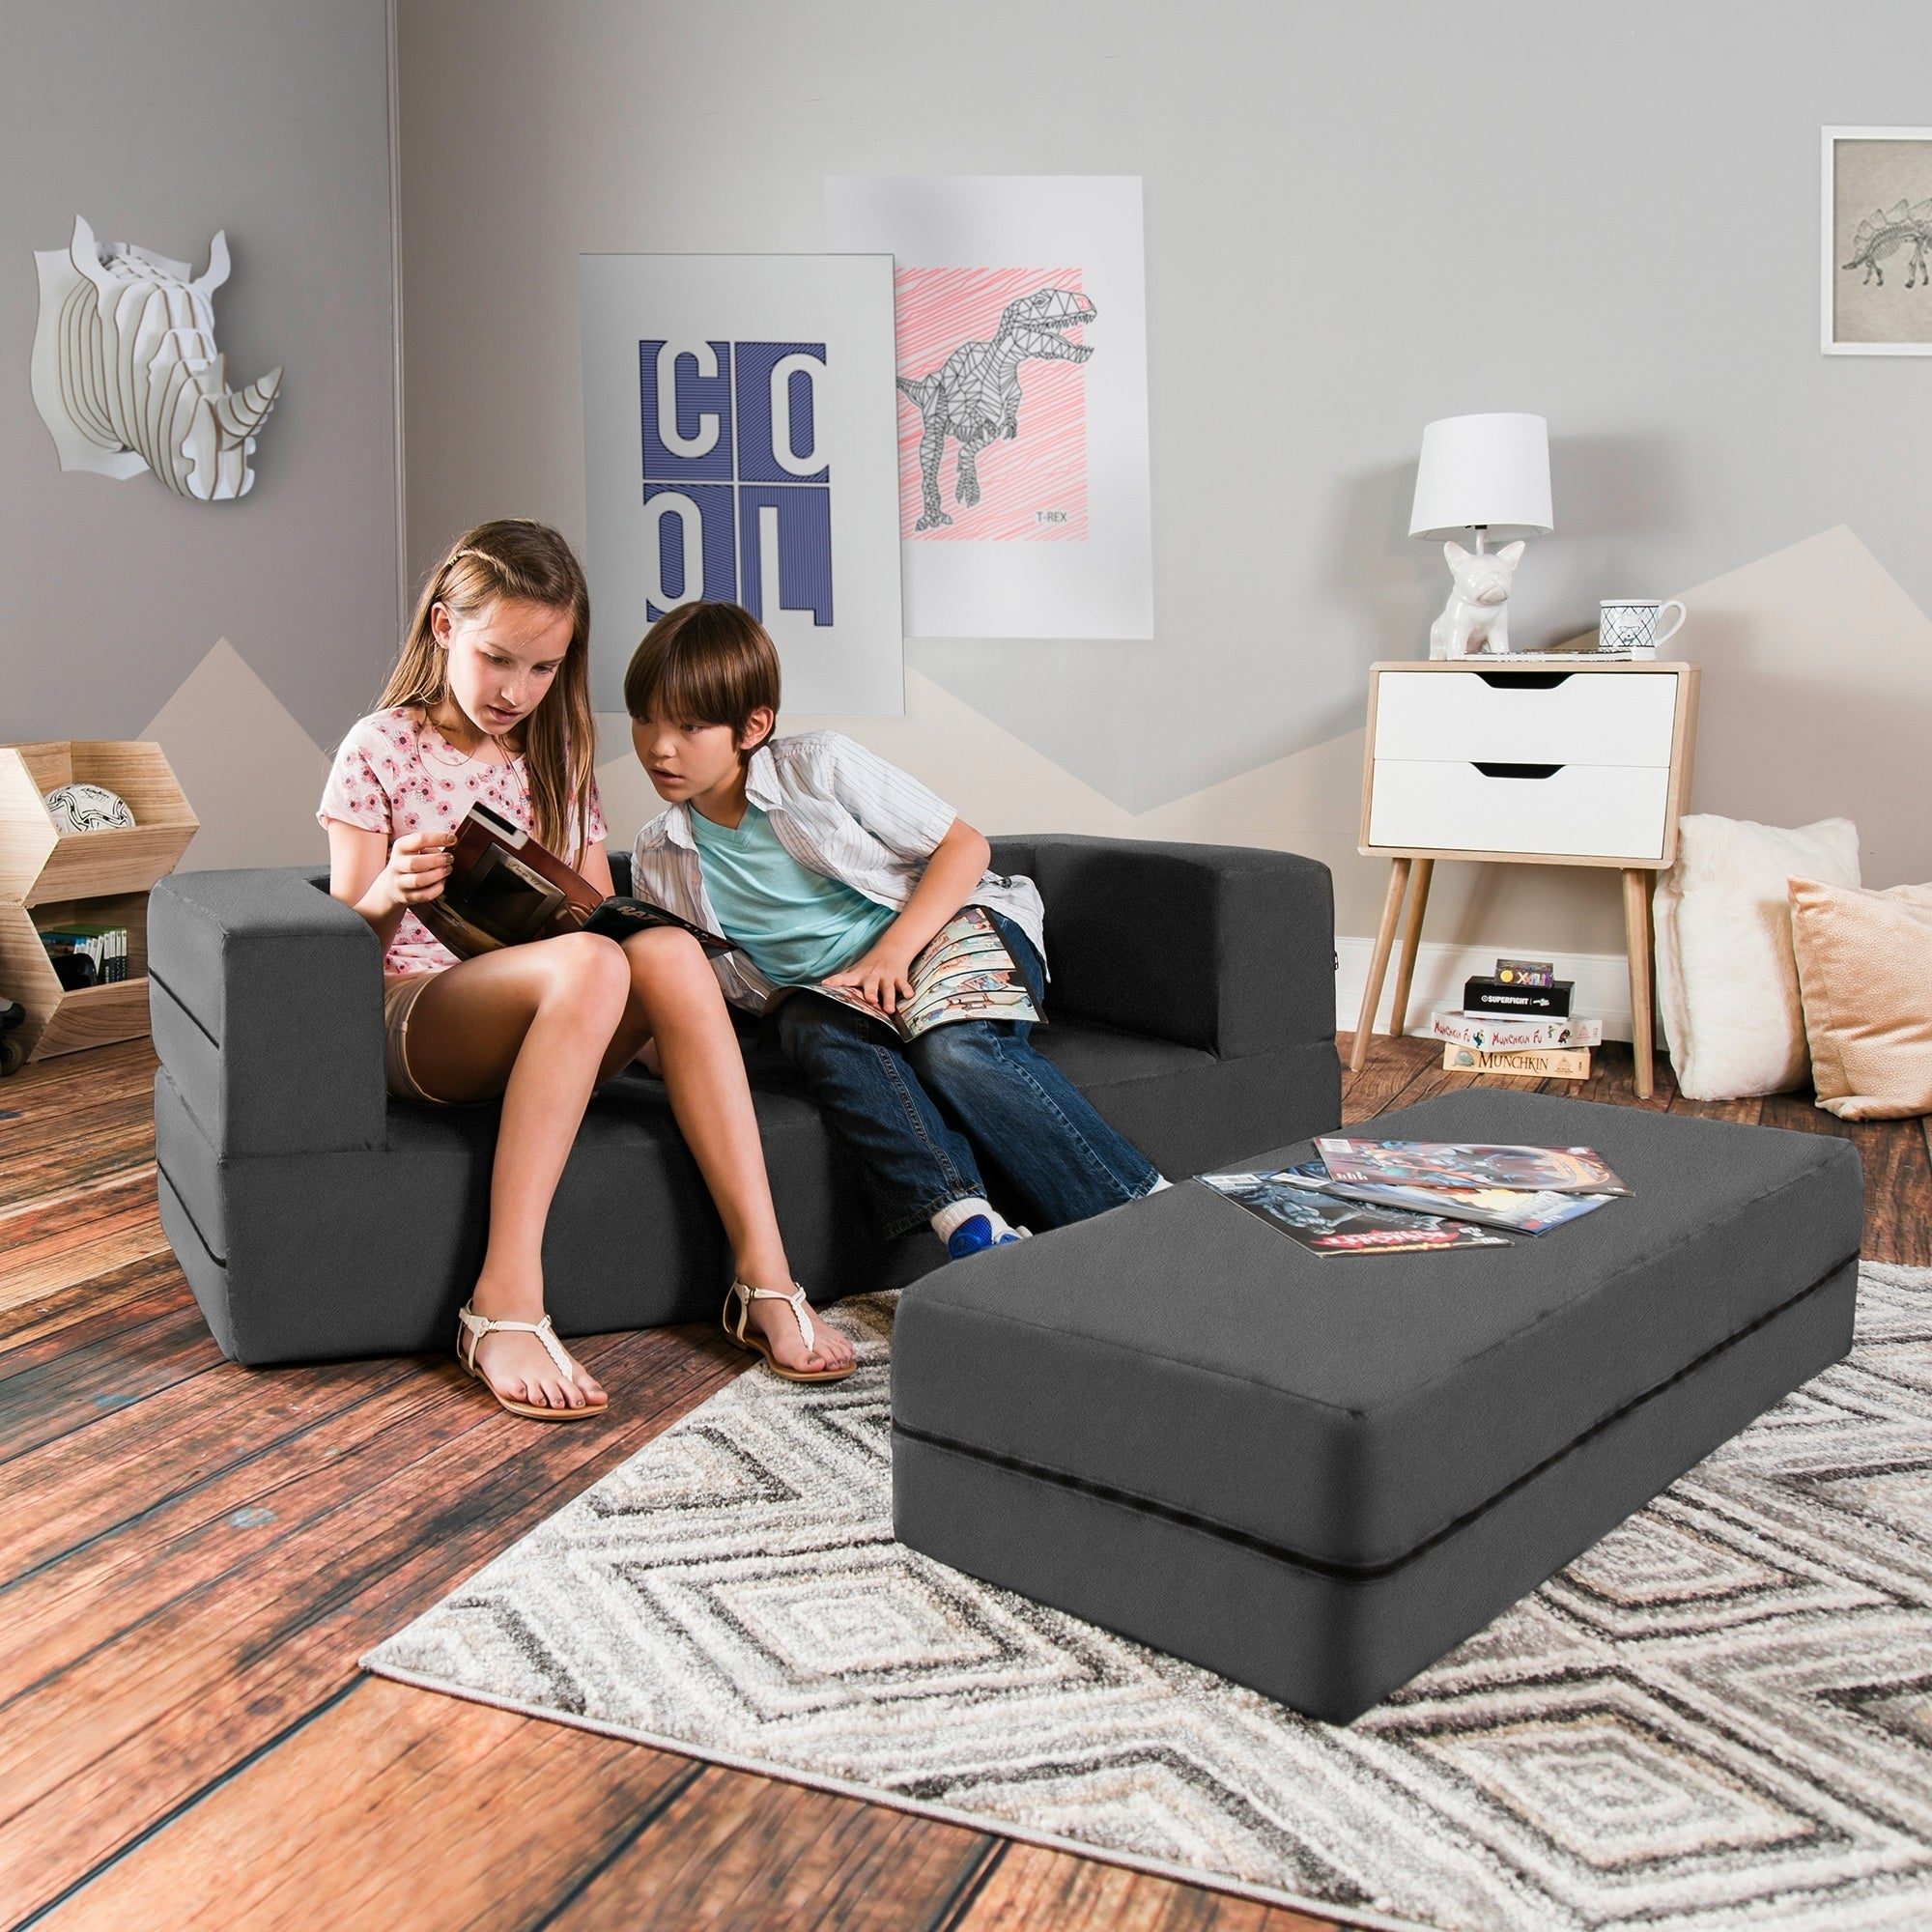 Critter Sitters Plush Hippopotamus Storage Animal Ottoman Furniture For Nursery Bedroom Playroom Living Room Decor